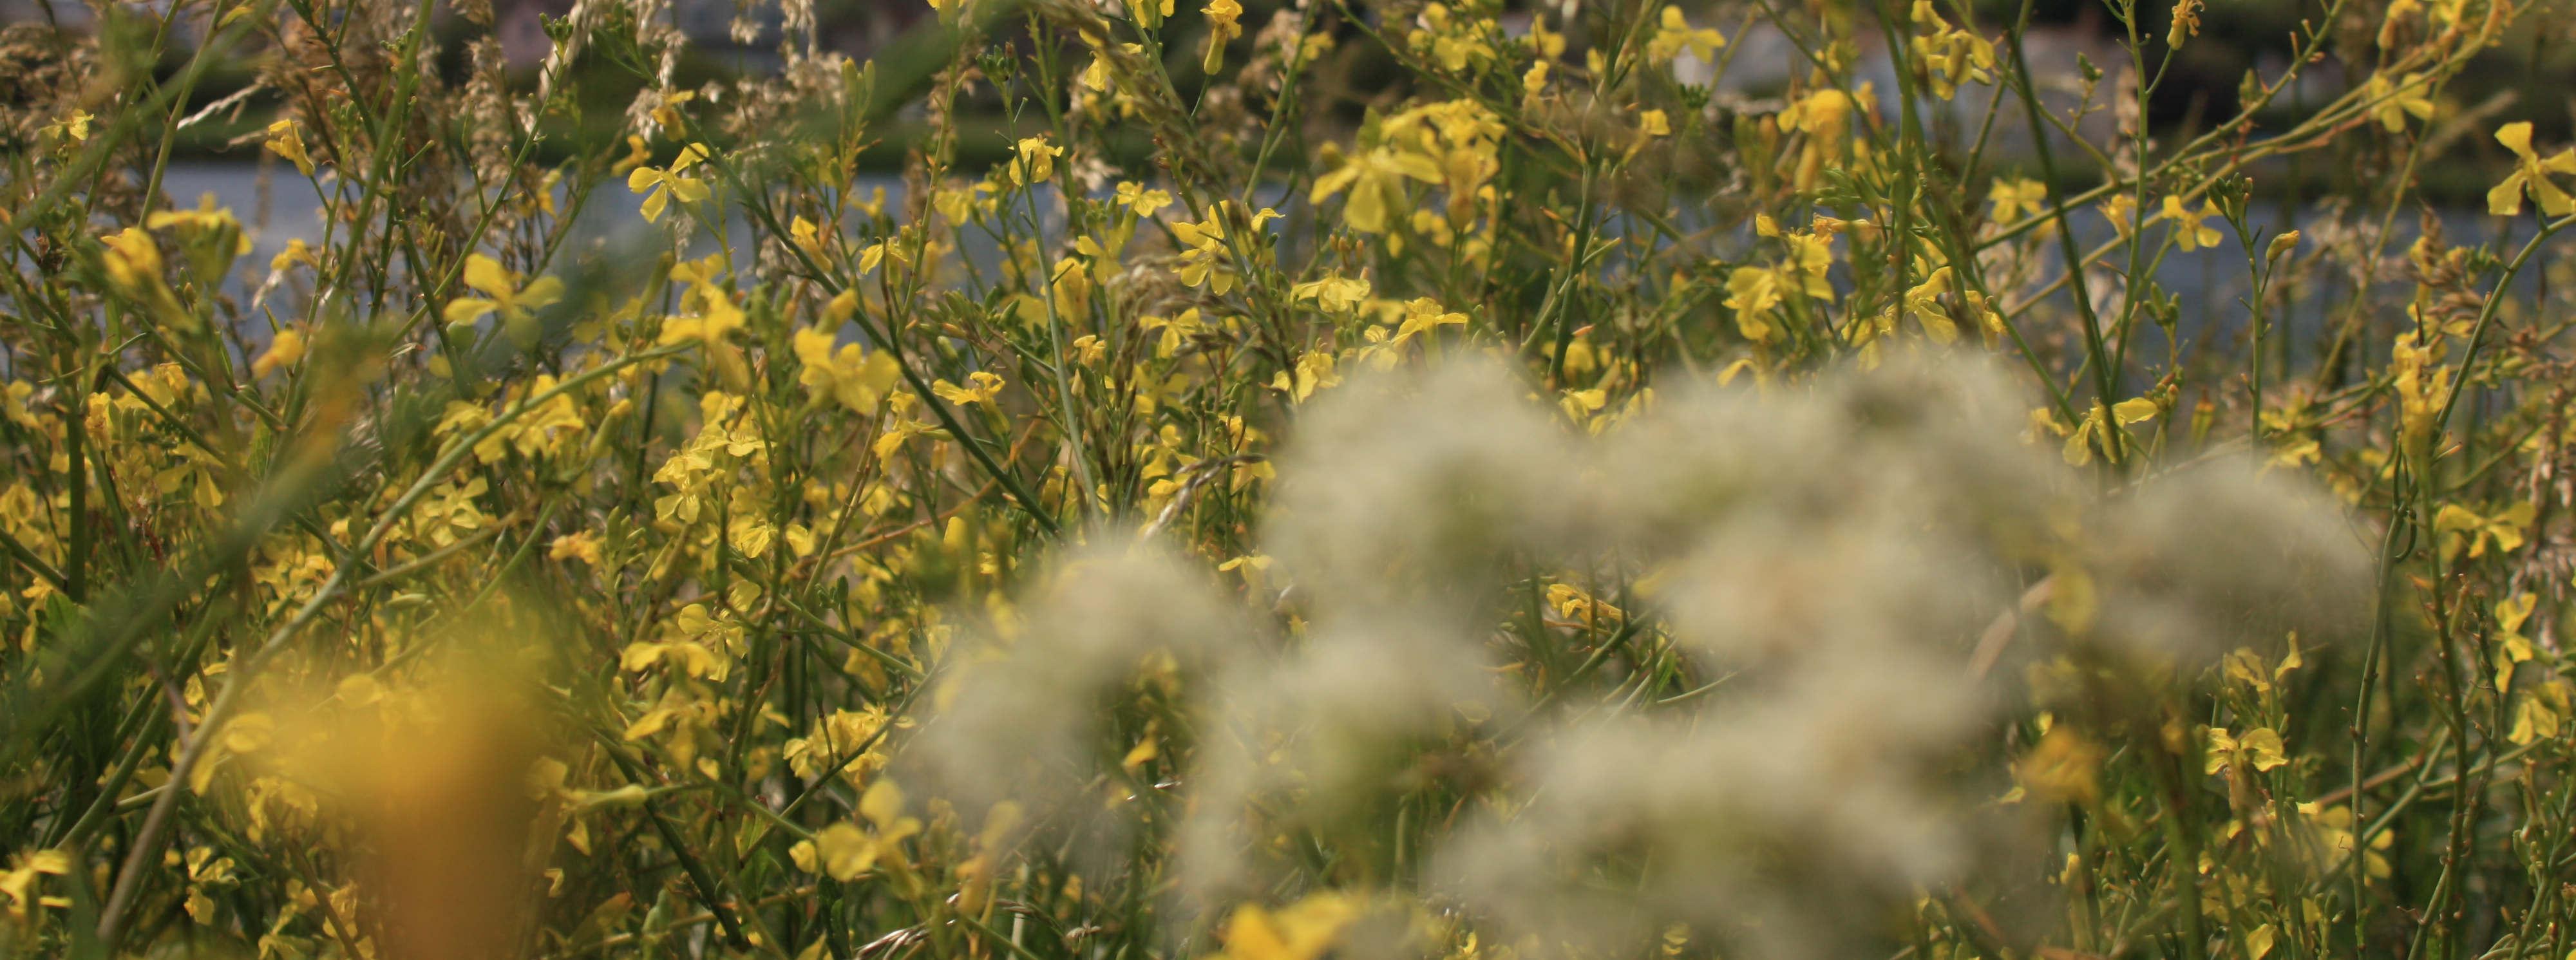 Flowers By Slapton Ley Wilton Farm